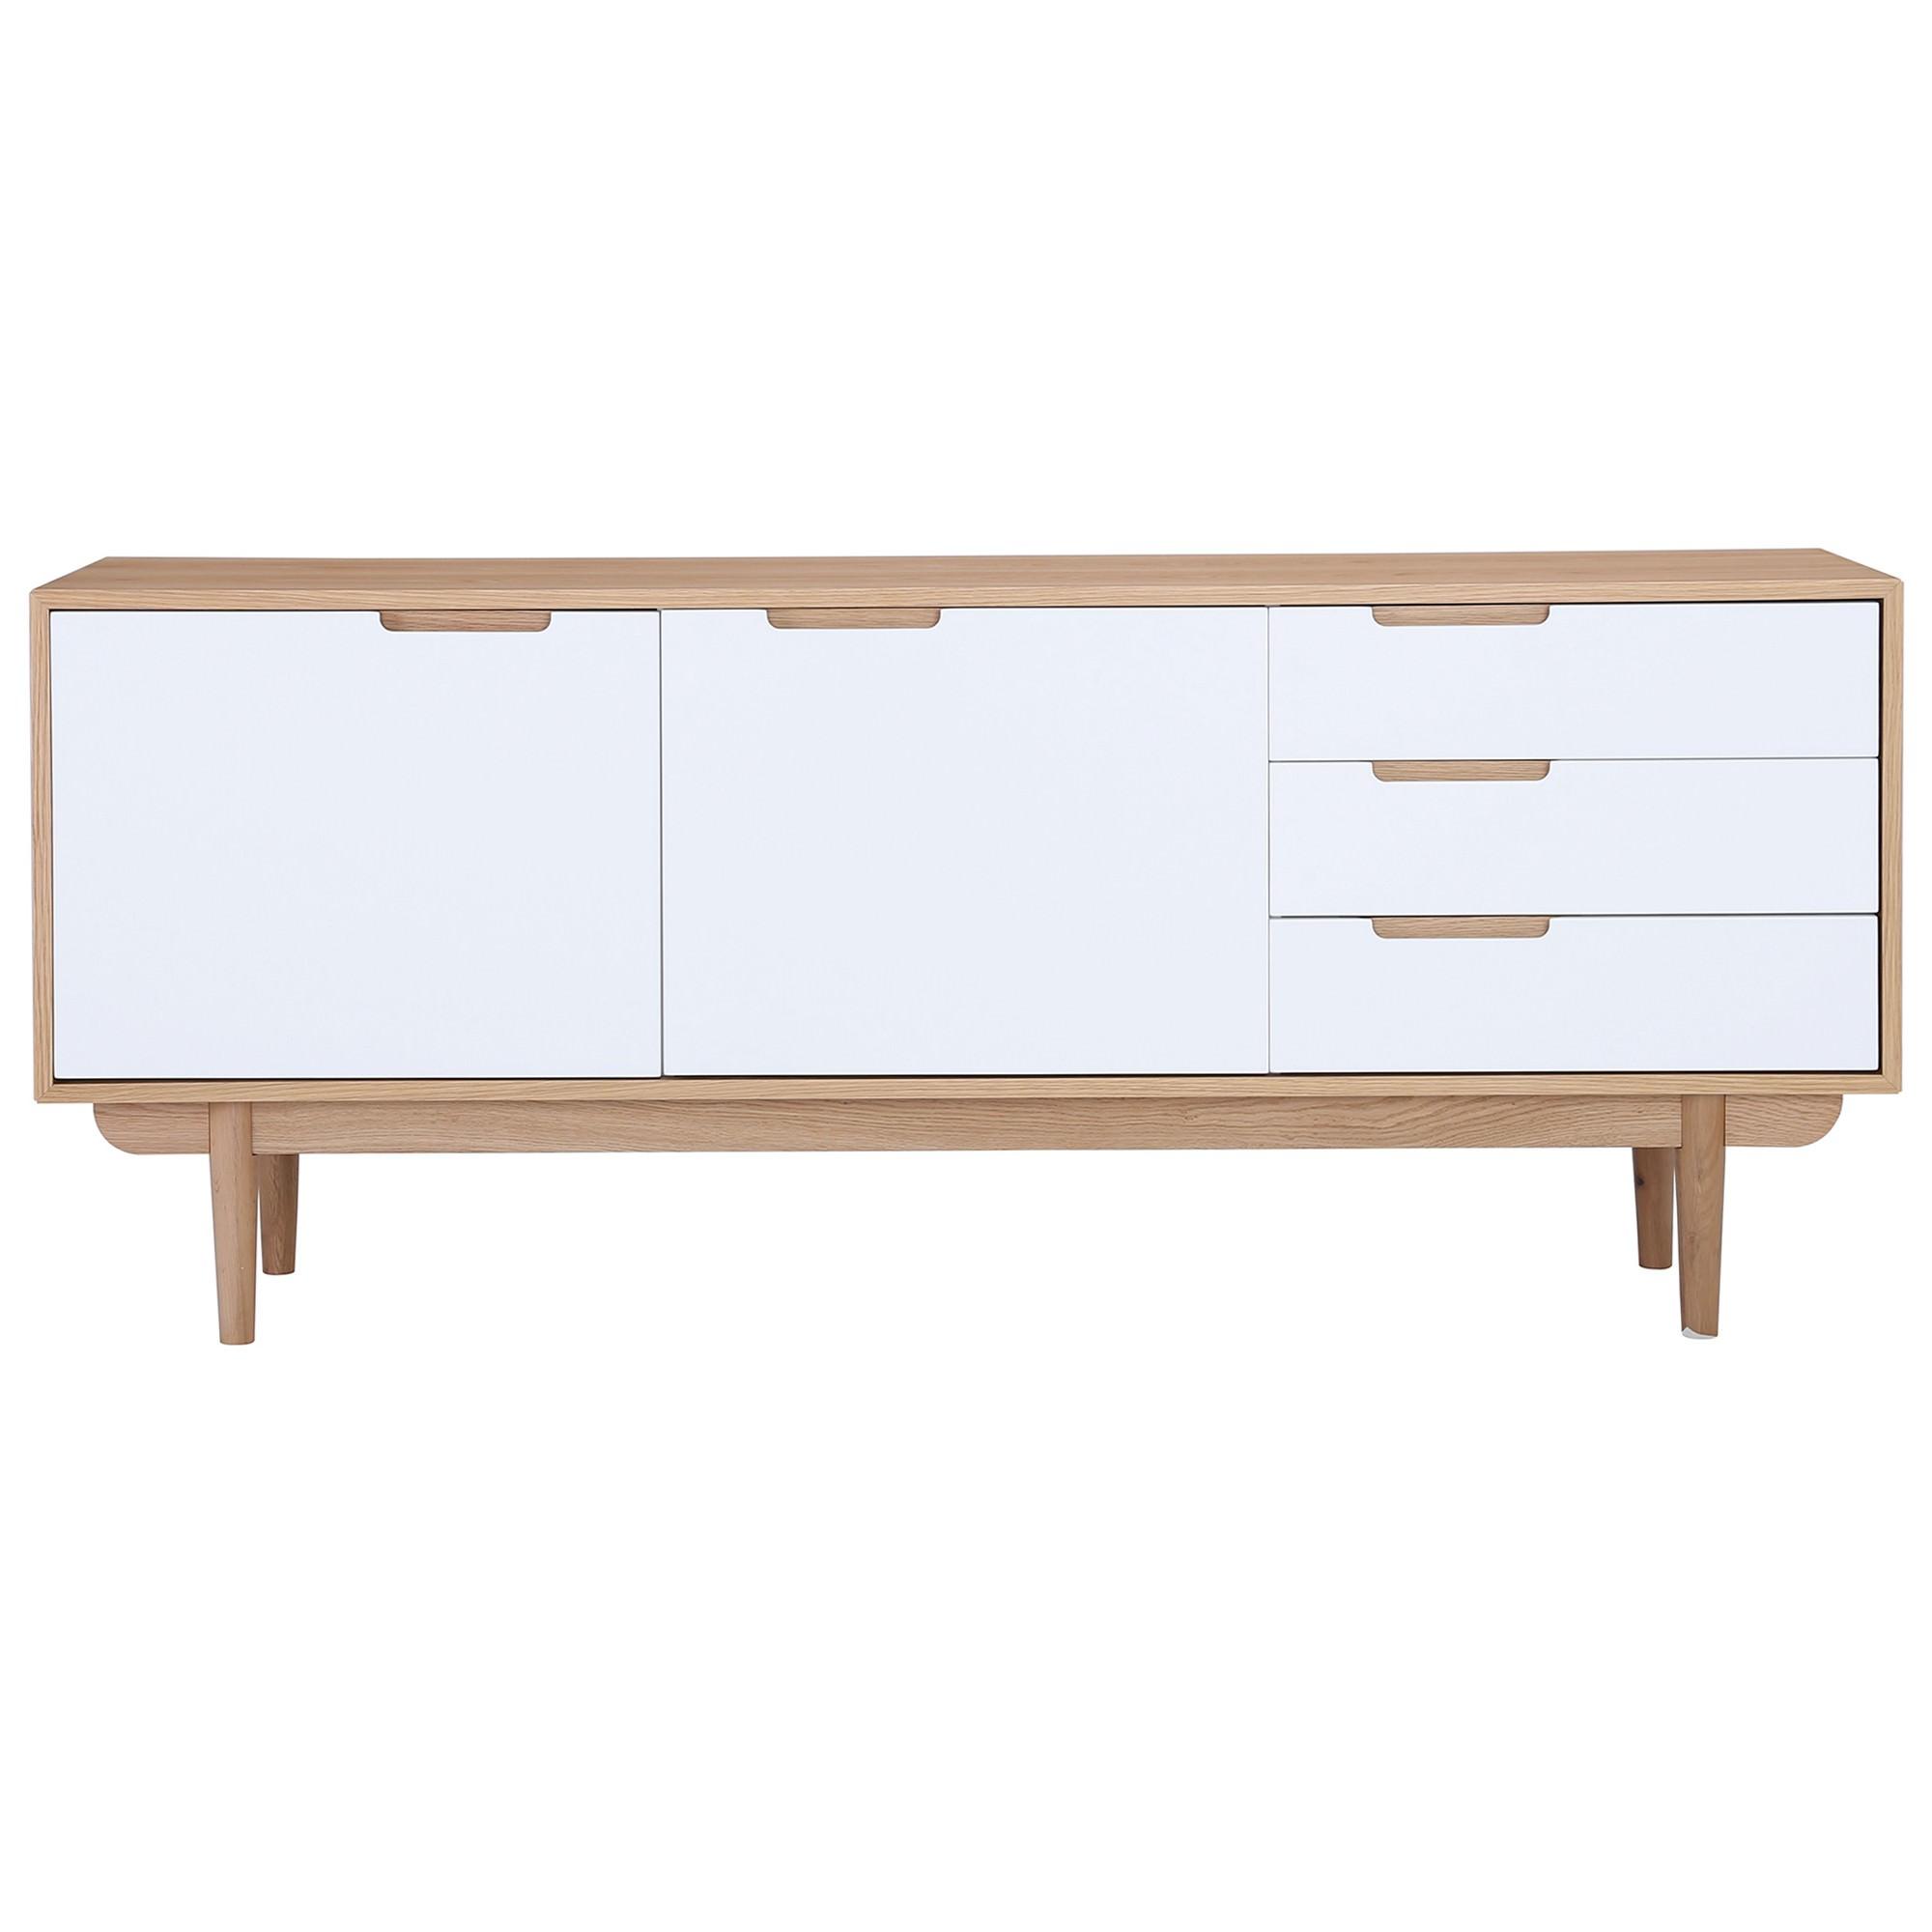 Nakula 2 Door 3 Drawer Sideboard, 180cm, Natural / White